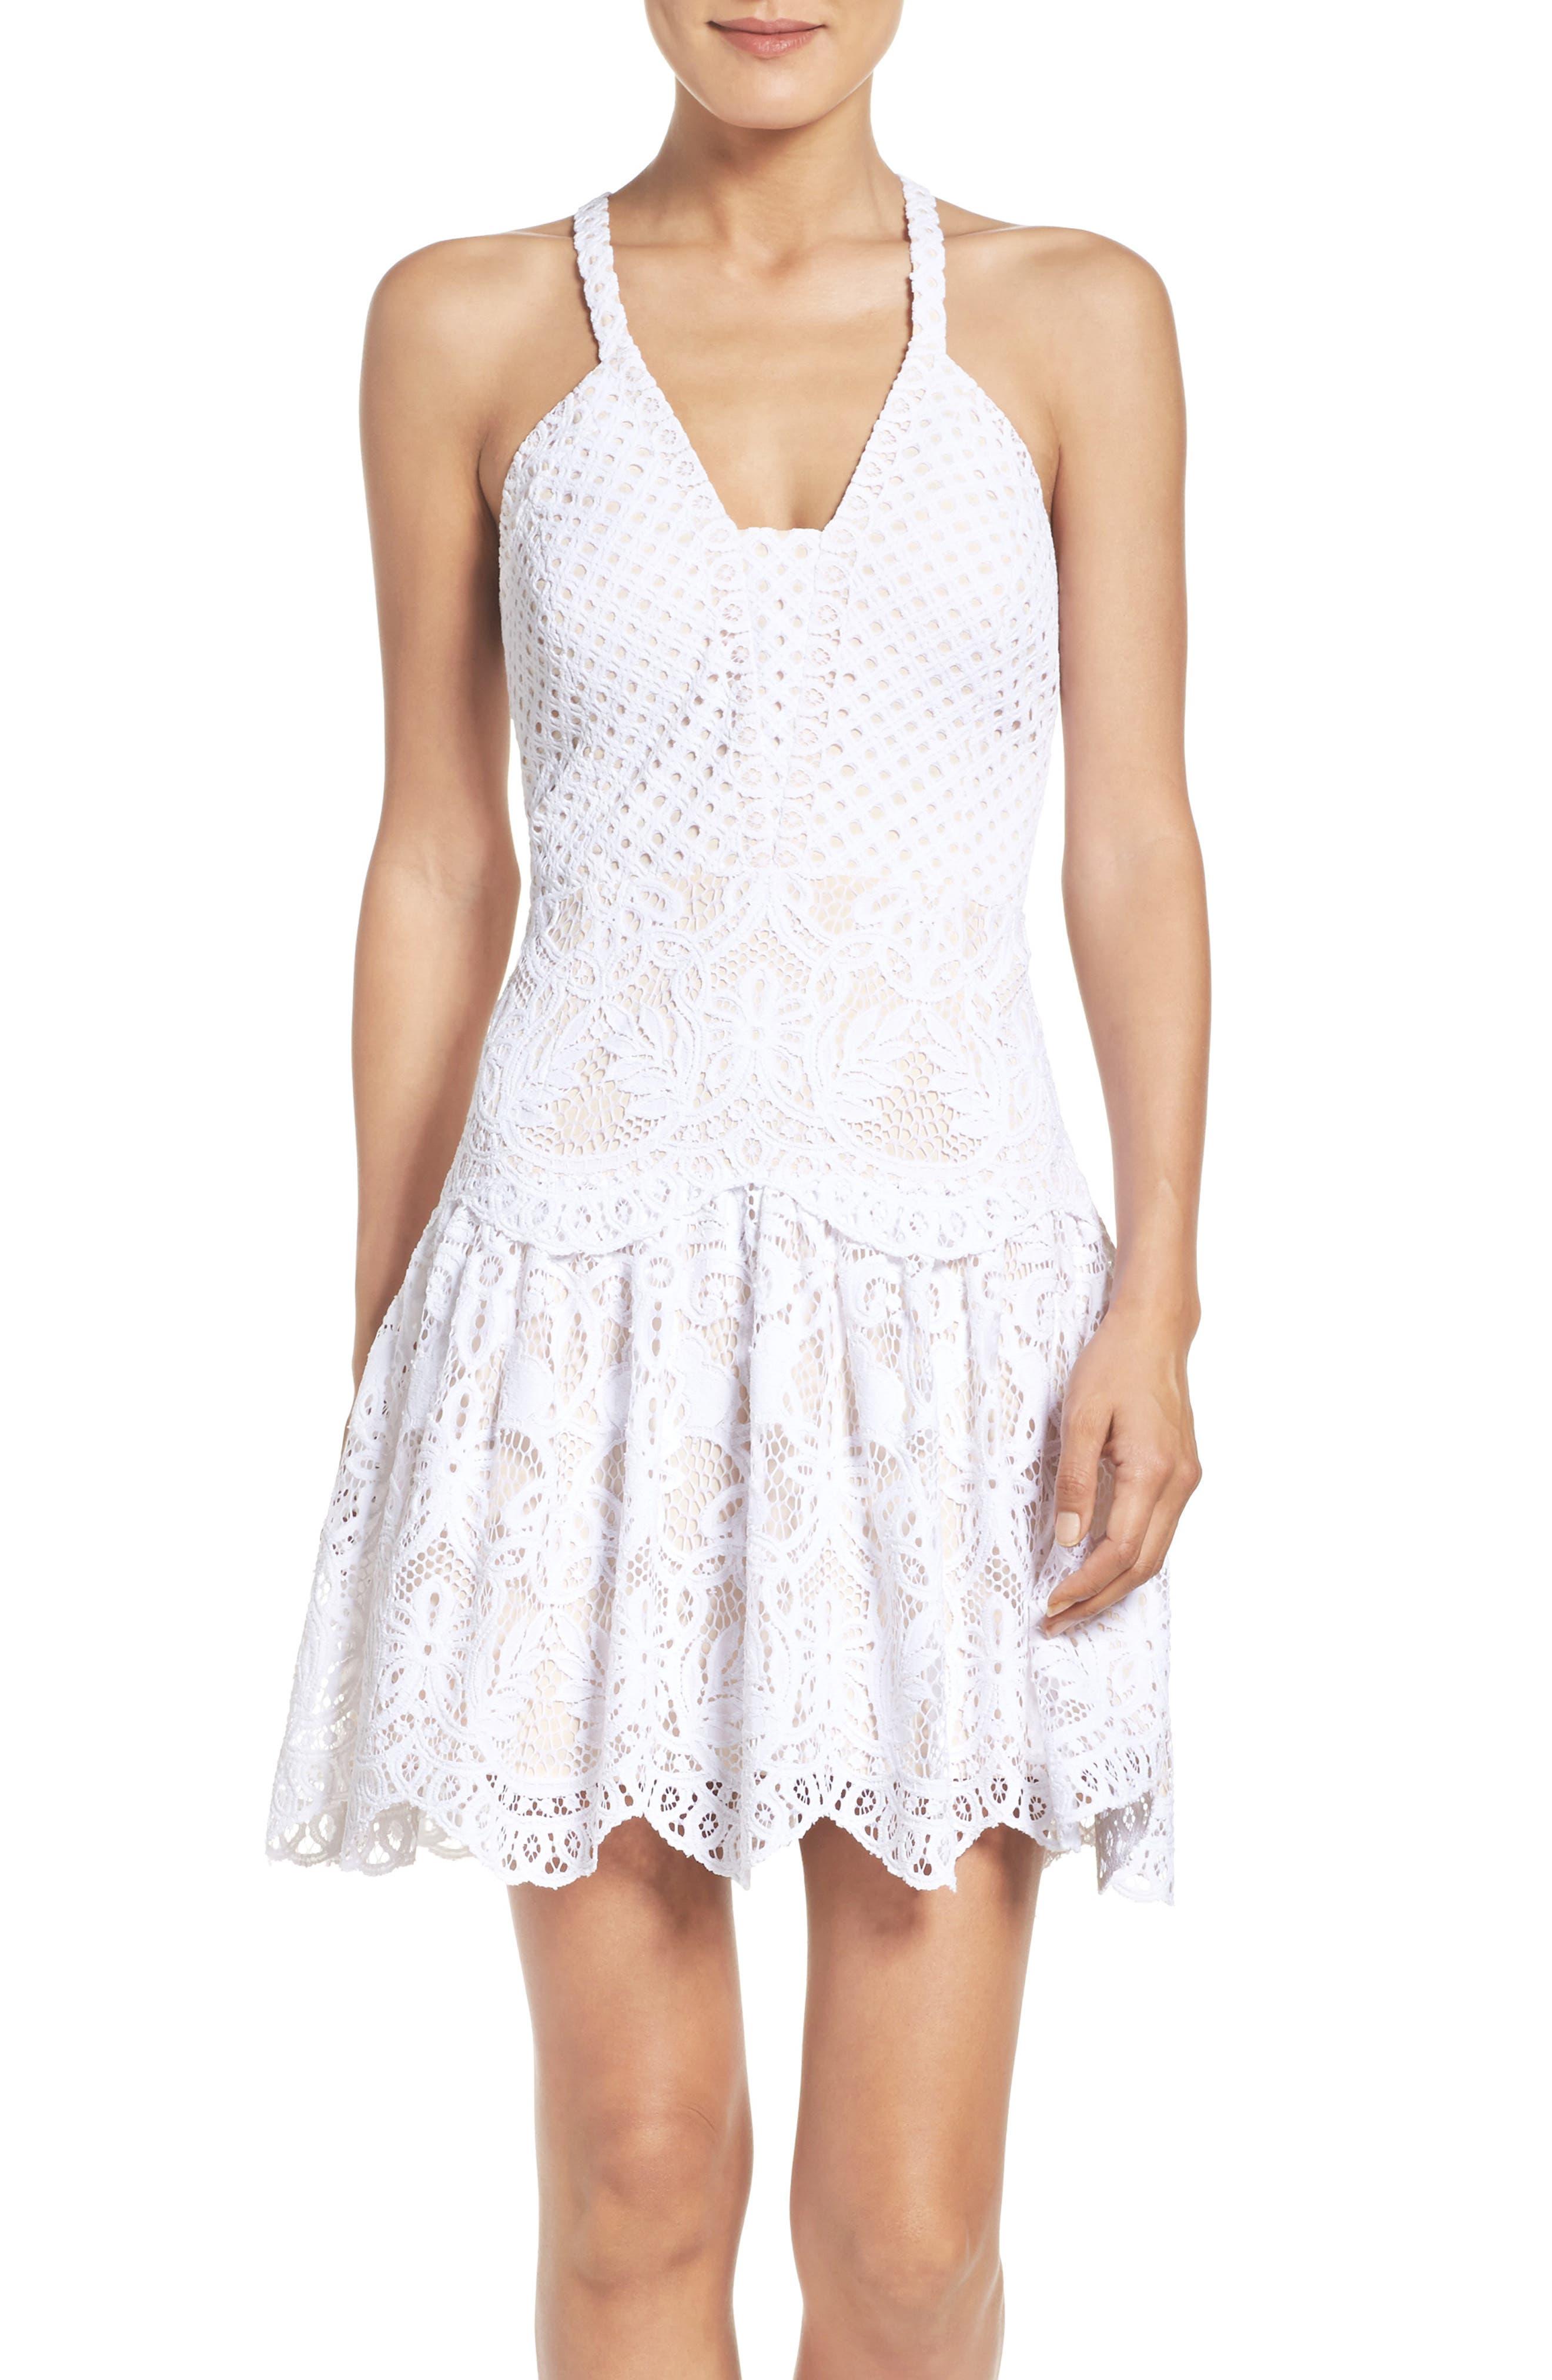 Adella Lace Dress,                             Main thumbnail 1, color,                             Resort White